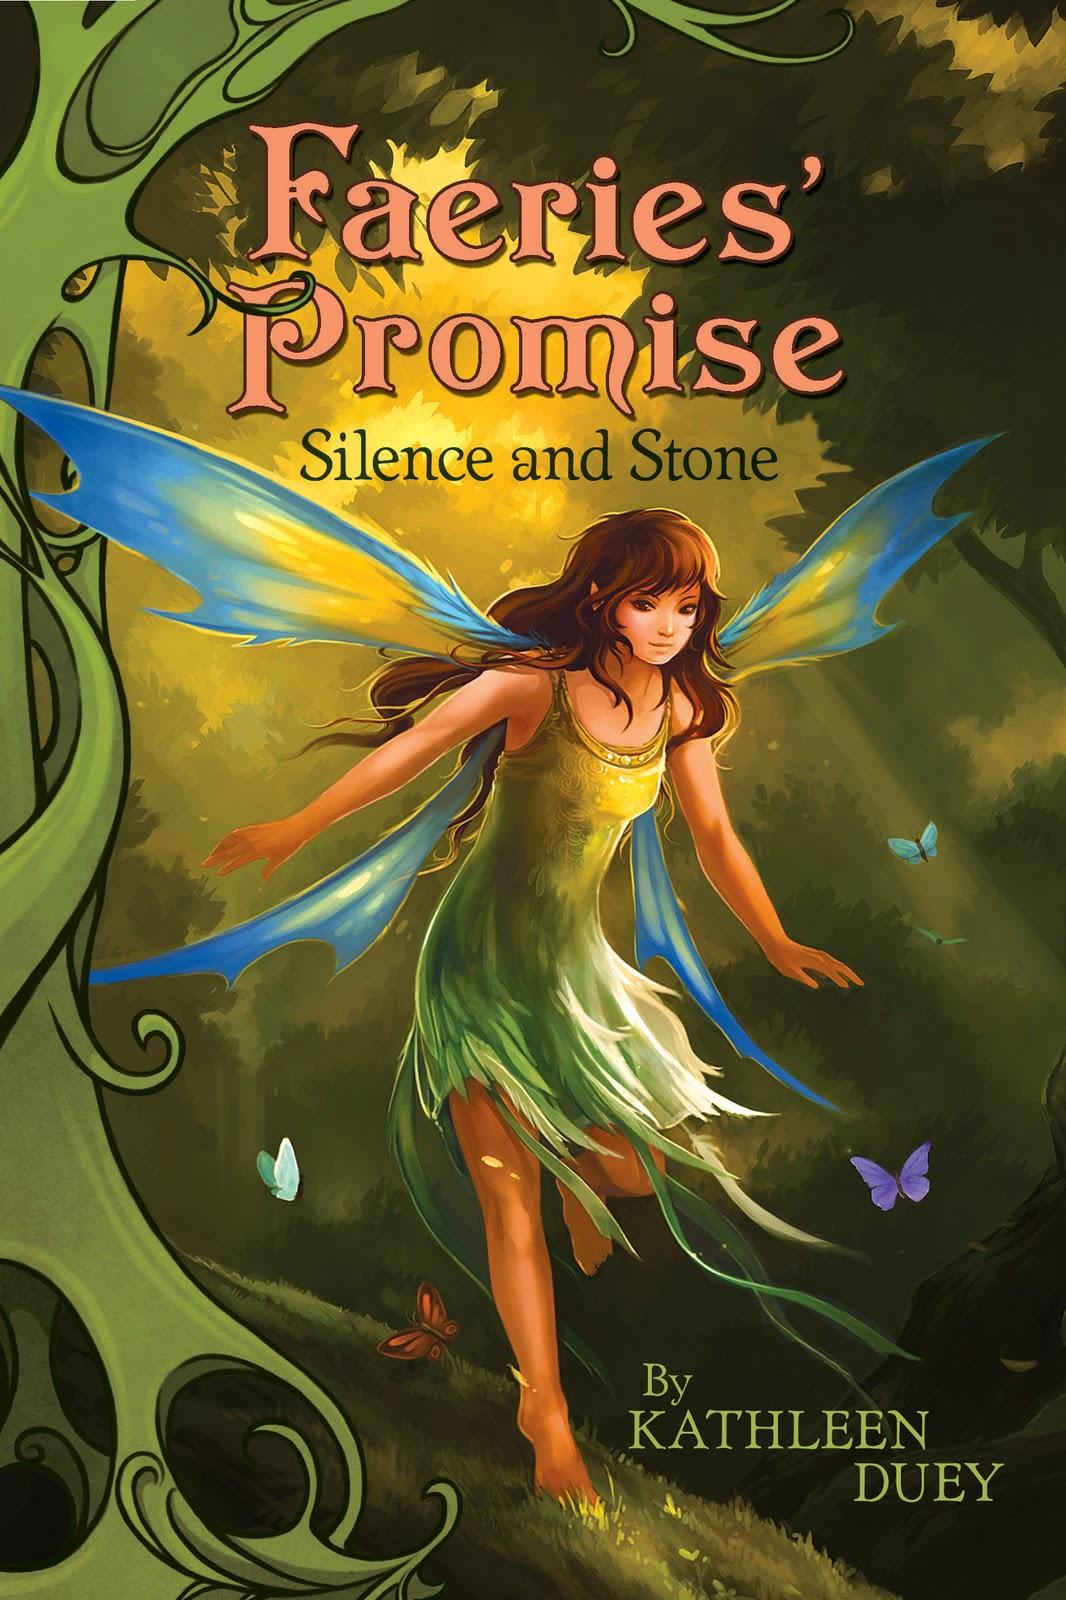 writerwriterwriter: THE FAERIES' PROMISE